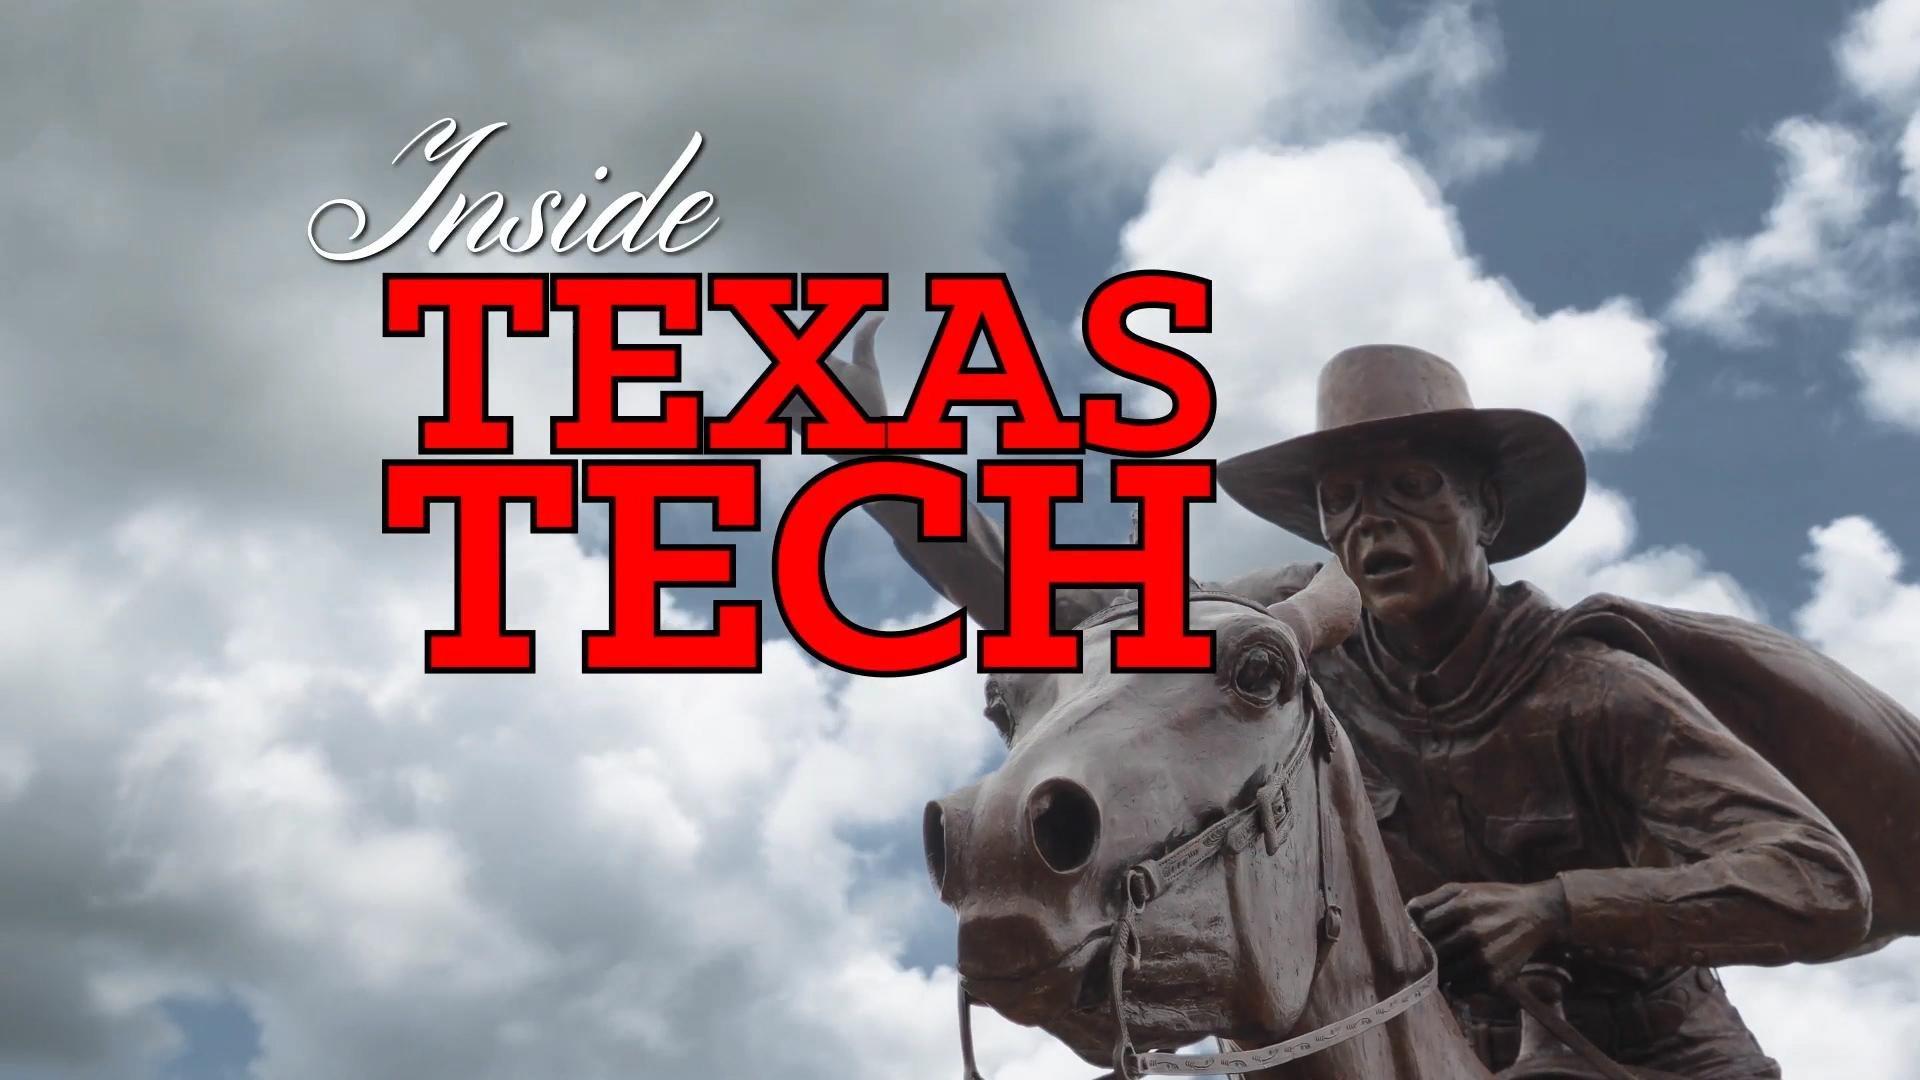 TEXAS TECH RED RAIDERS college football texastech wallpaper background 1920x1080